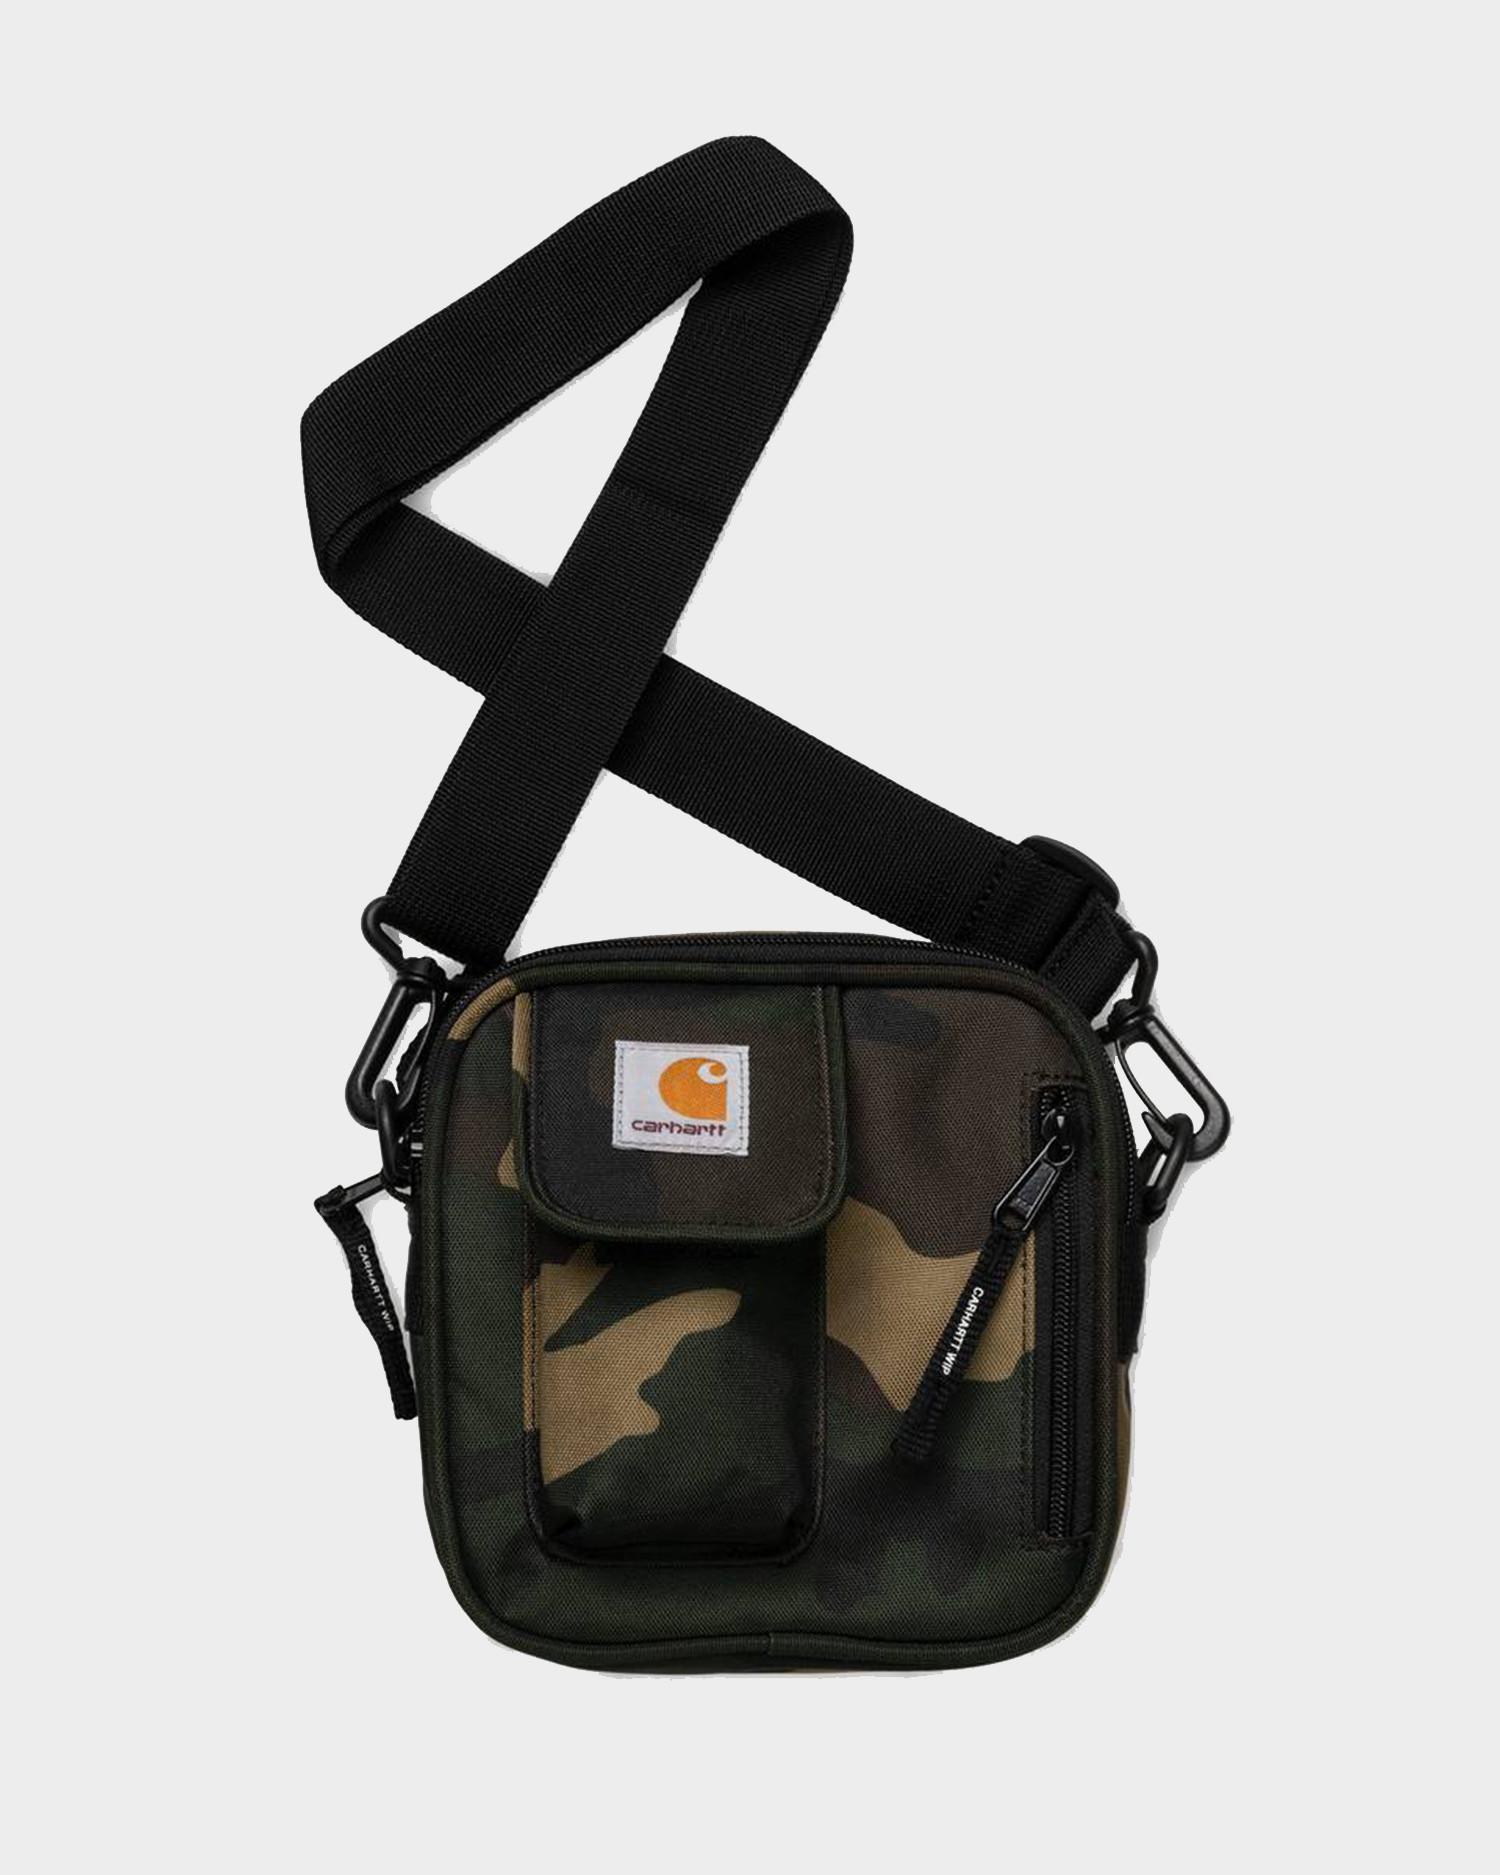 Carhartt Essentials Bag Duck Camo Laurel